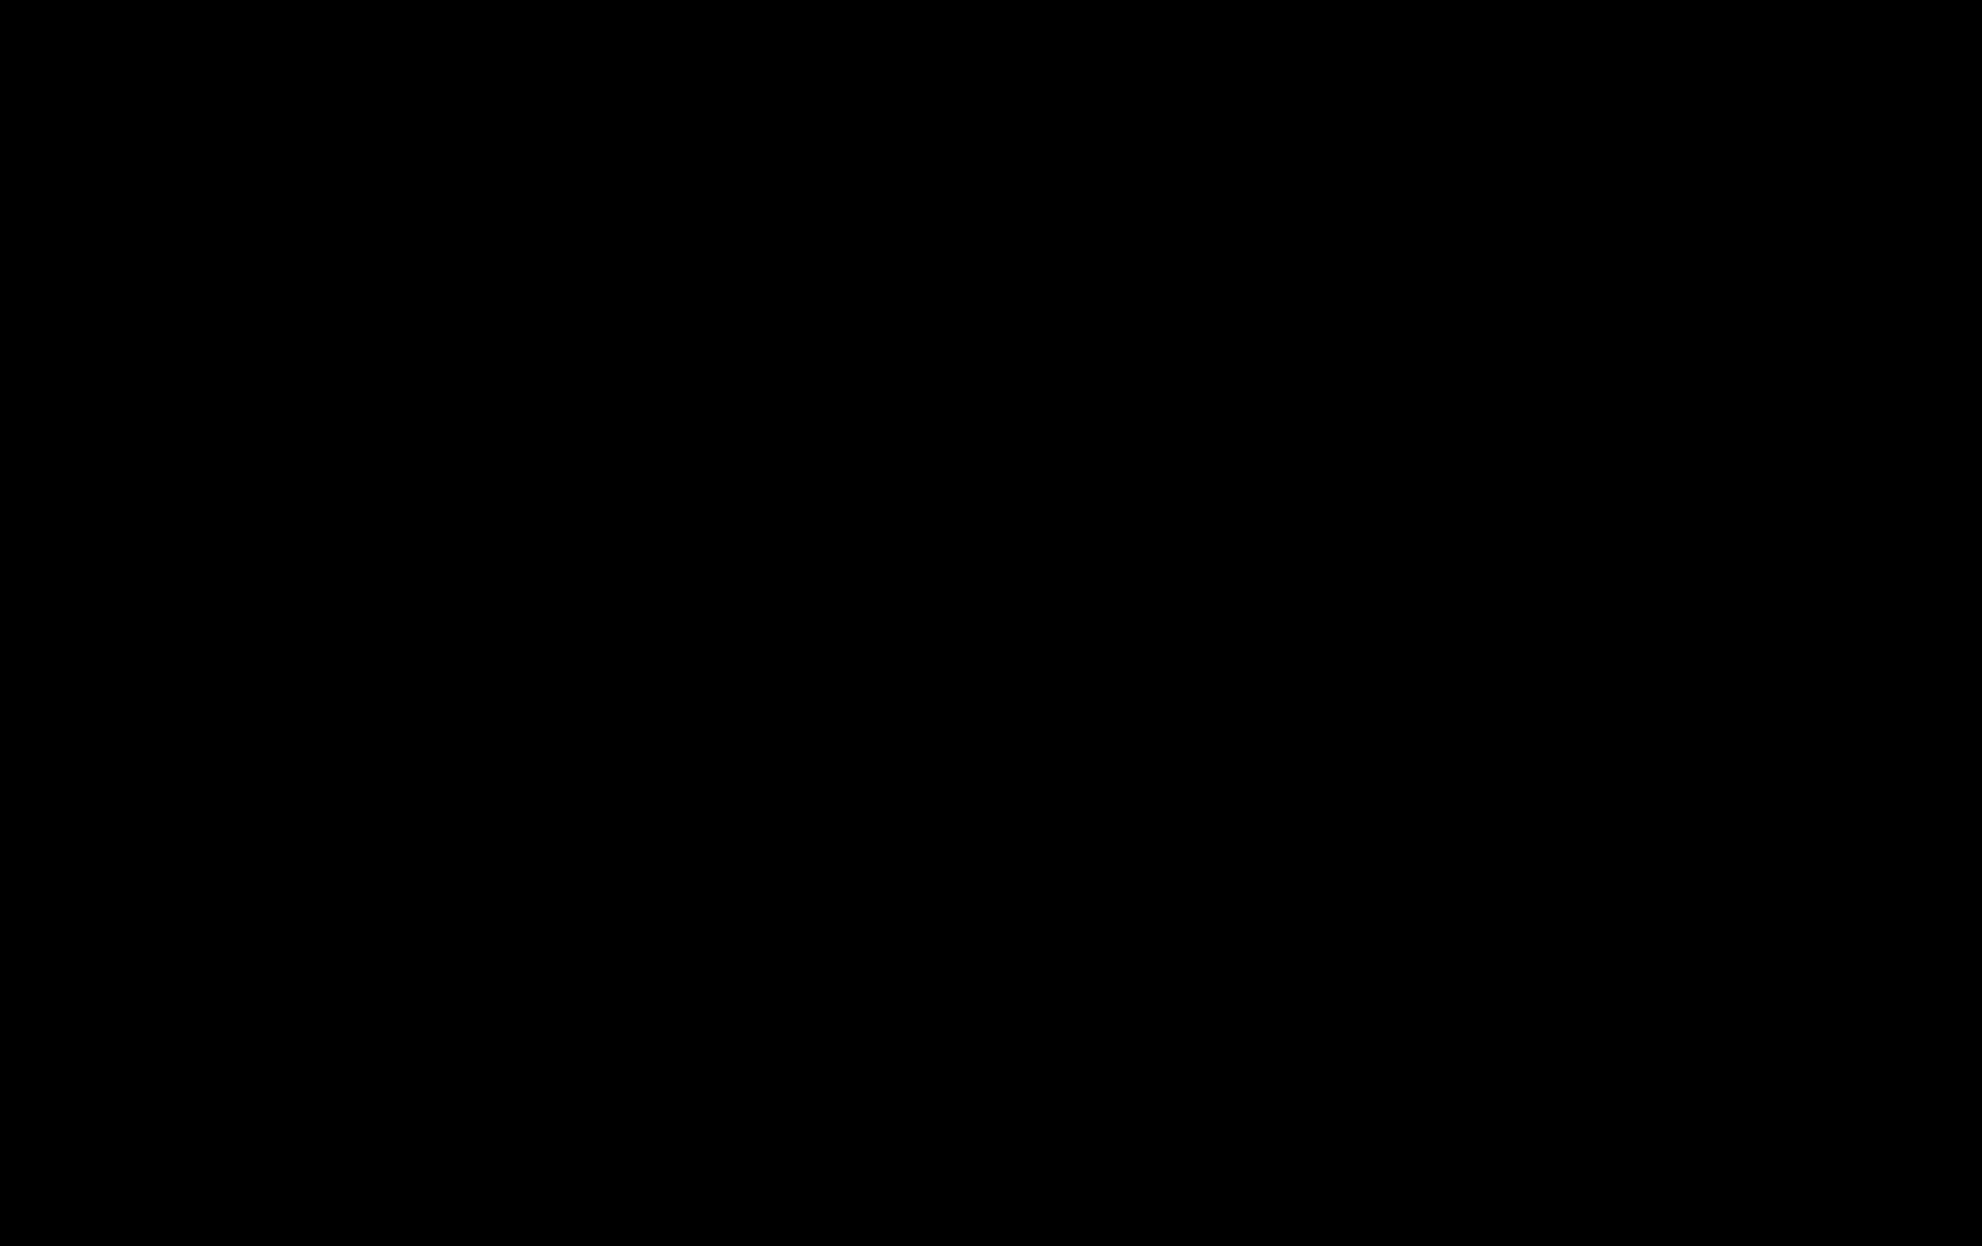 Draw And Interpret Circuit Diagrams Containing Magnetizing Coils Aurora Ups Diagram P13 1 Igcse Aid